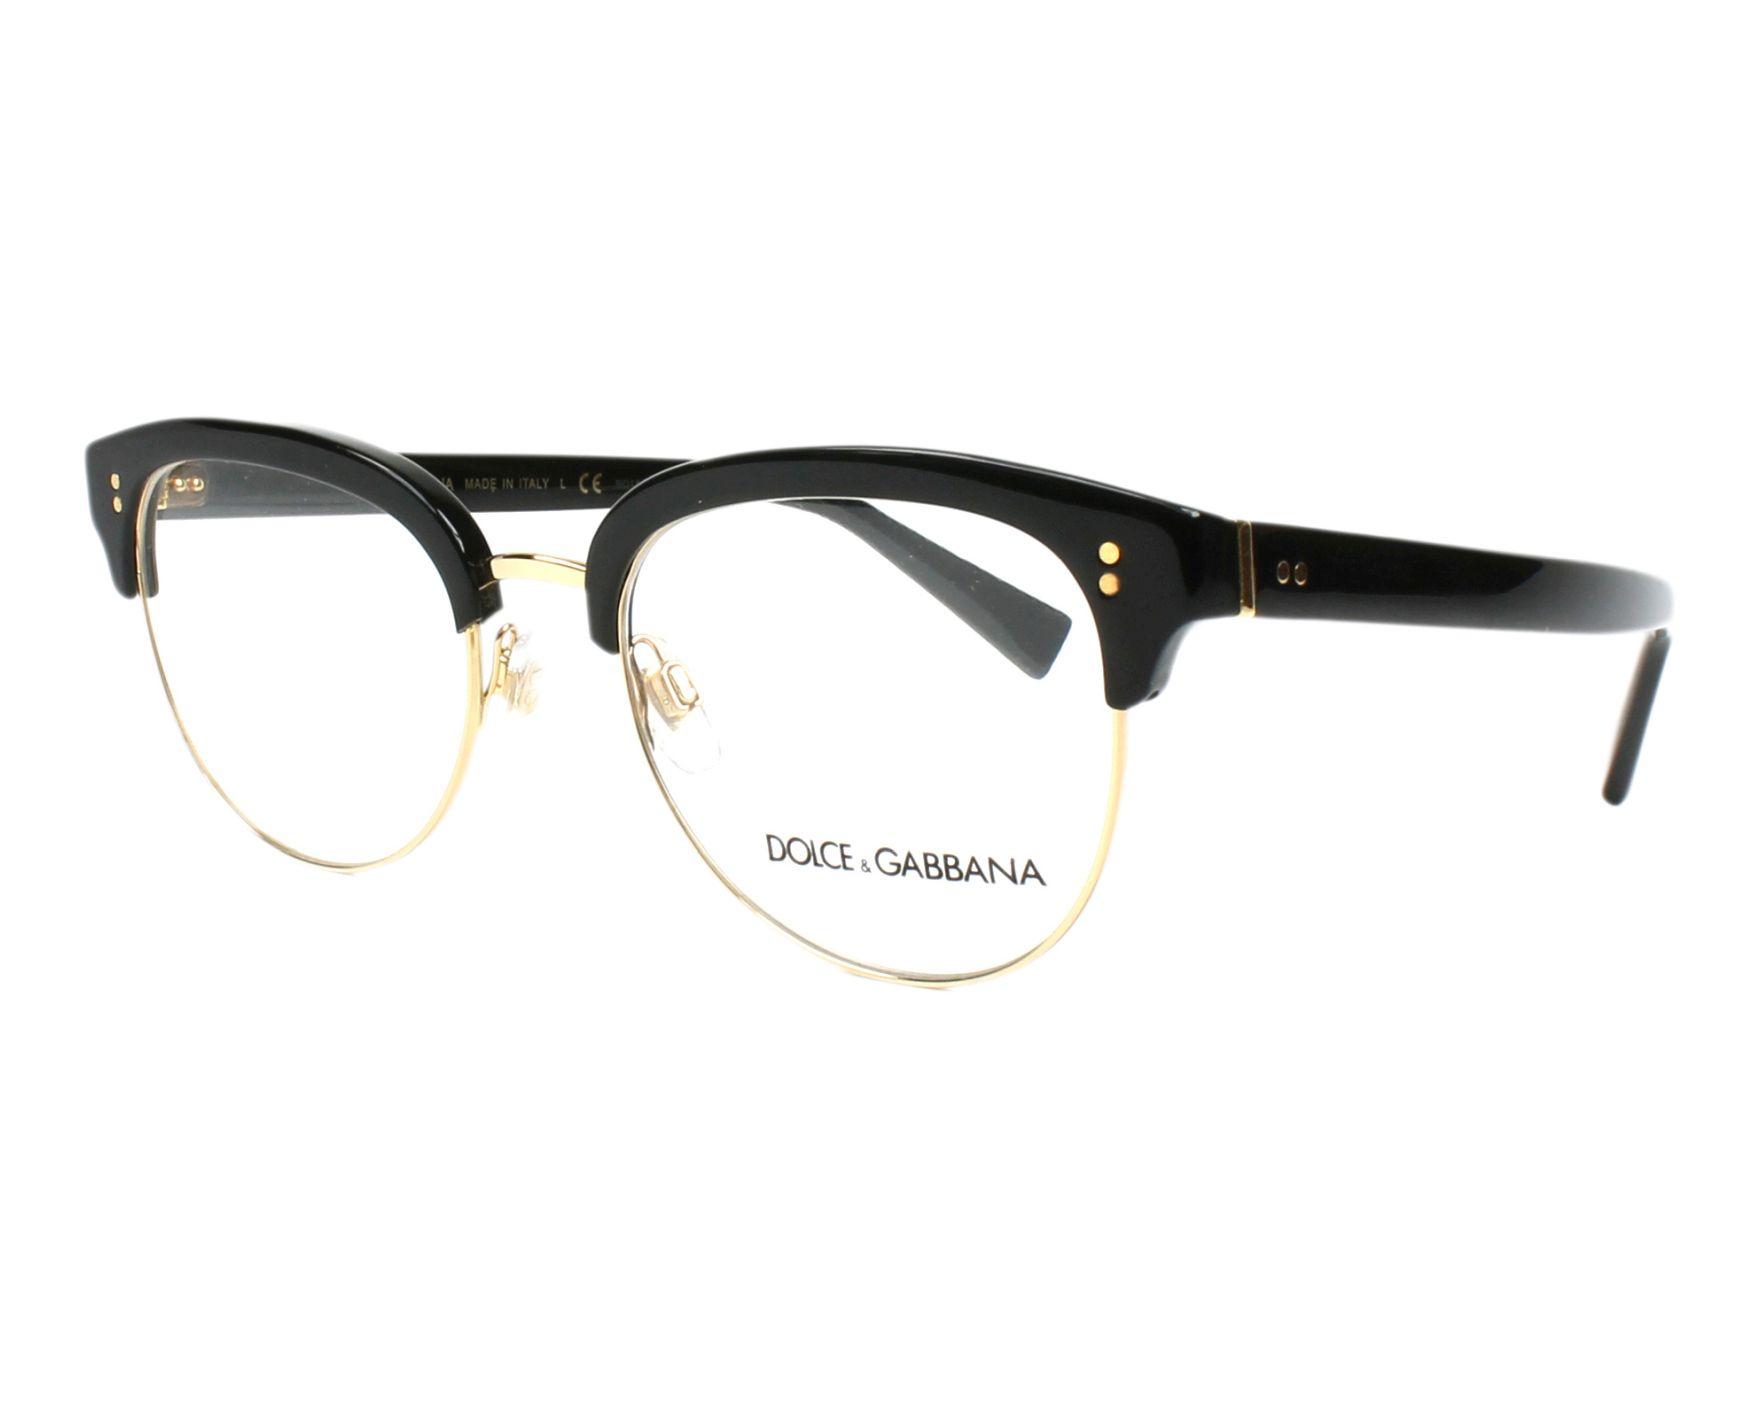 Dolce & Gabbana Eyeglasses Black DG-3270 501 - Visionet US